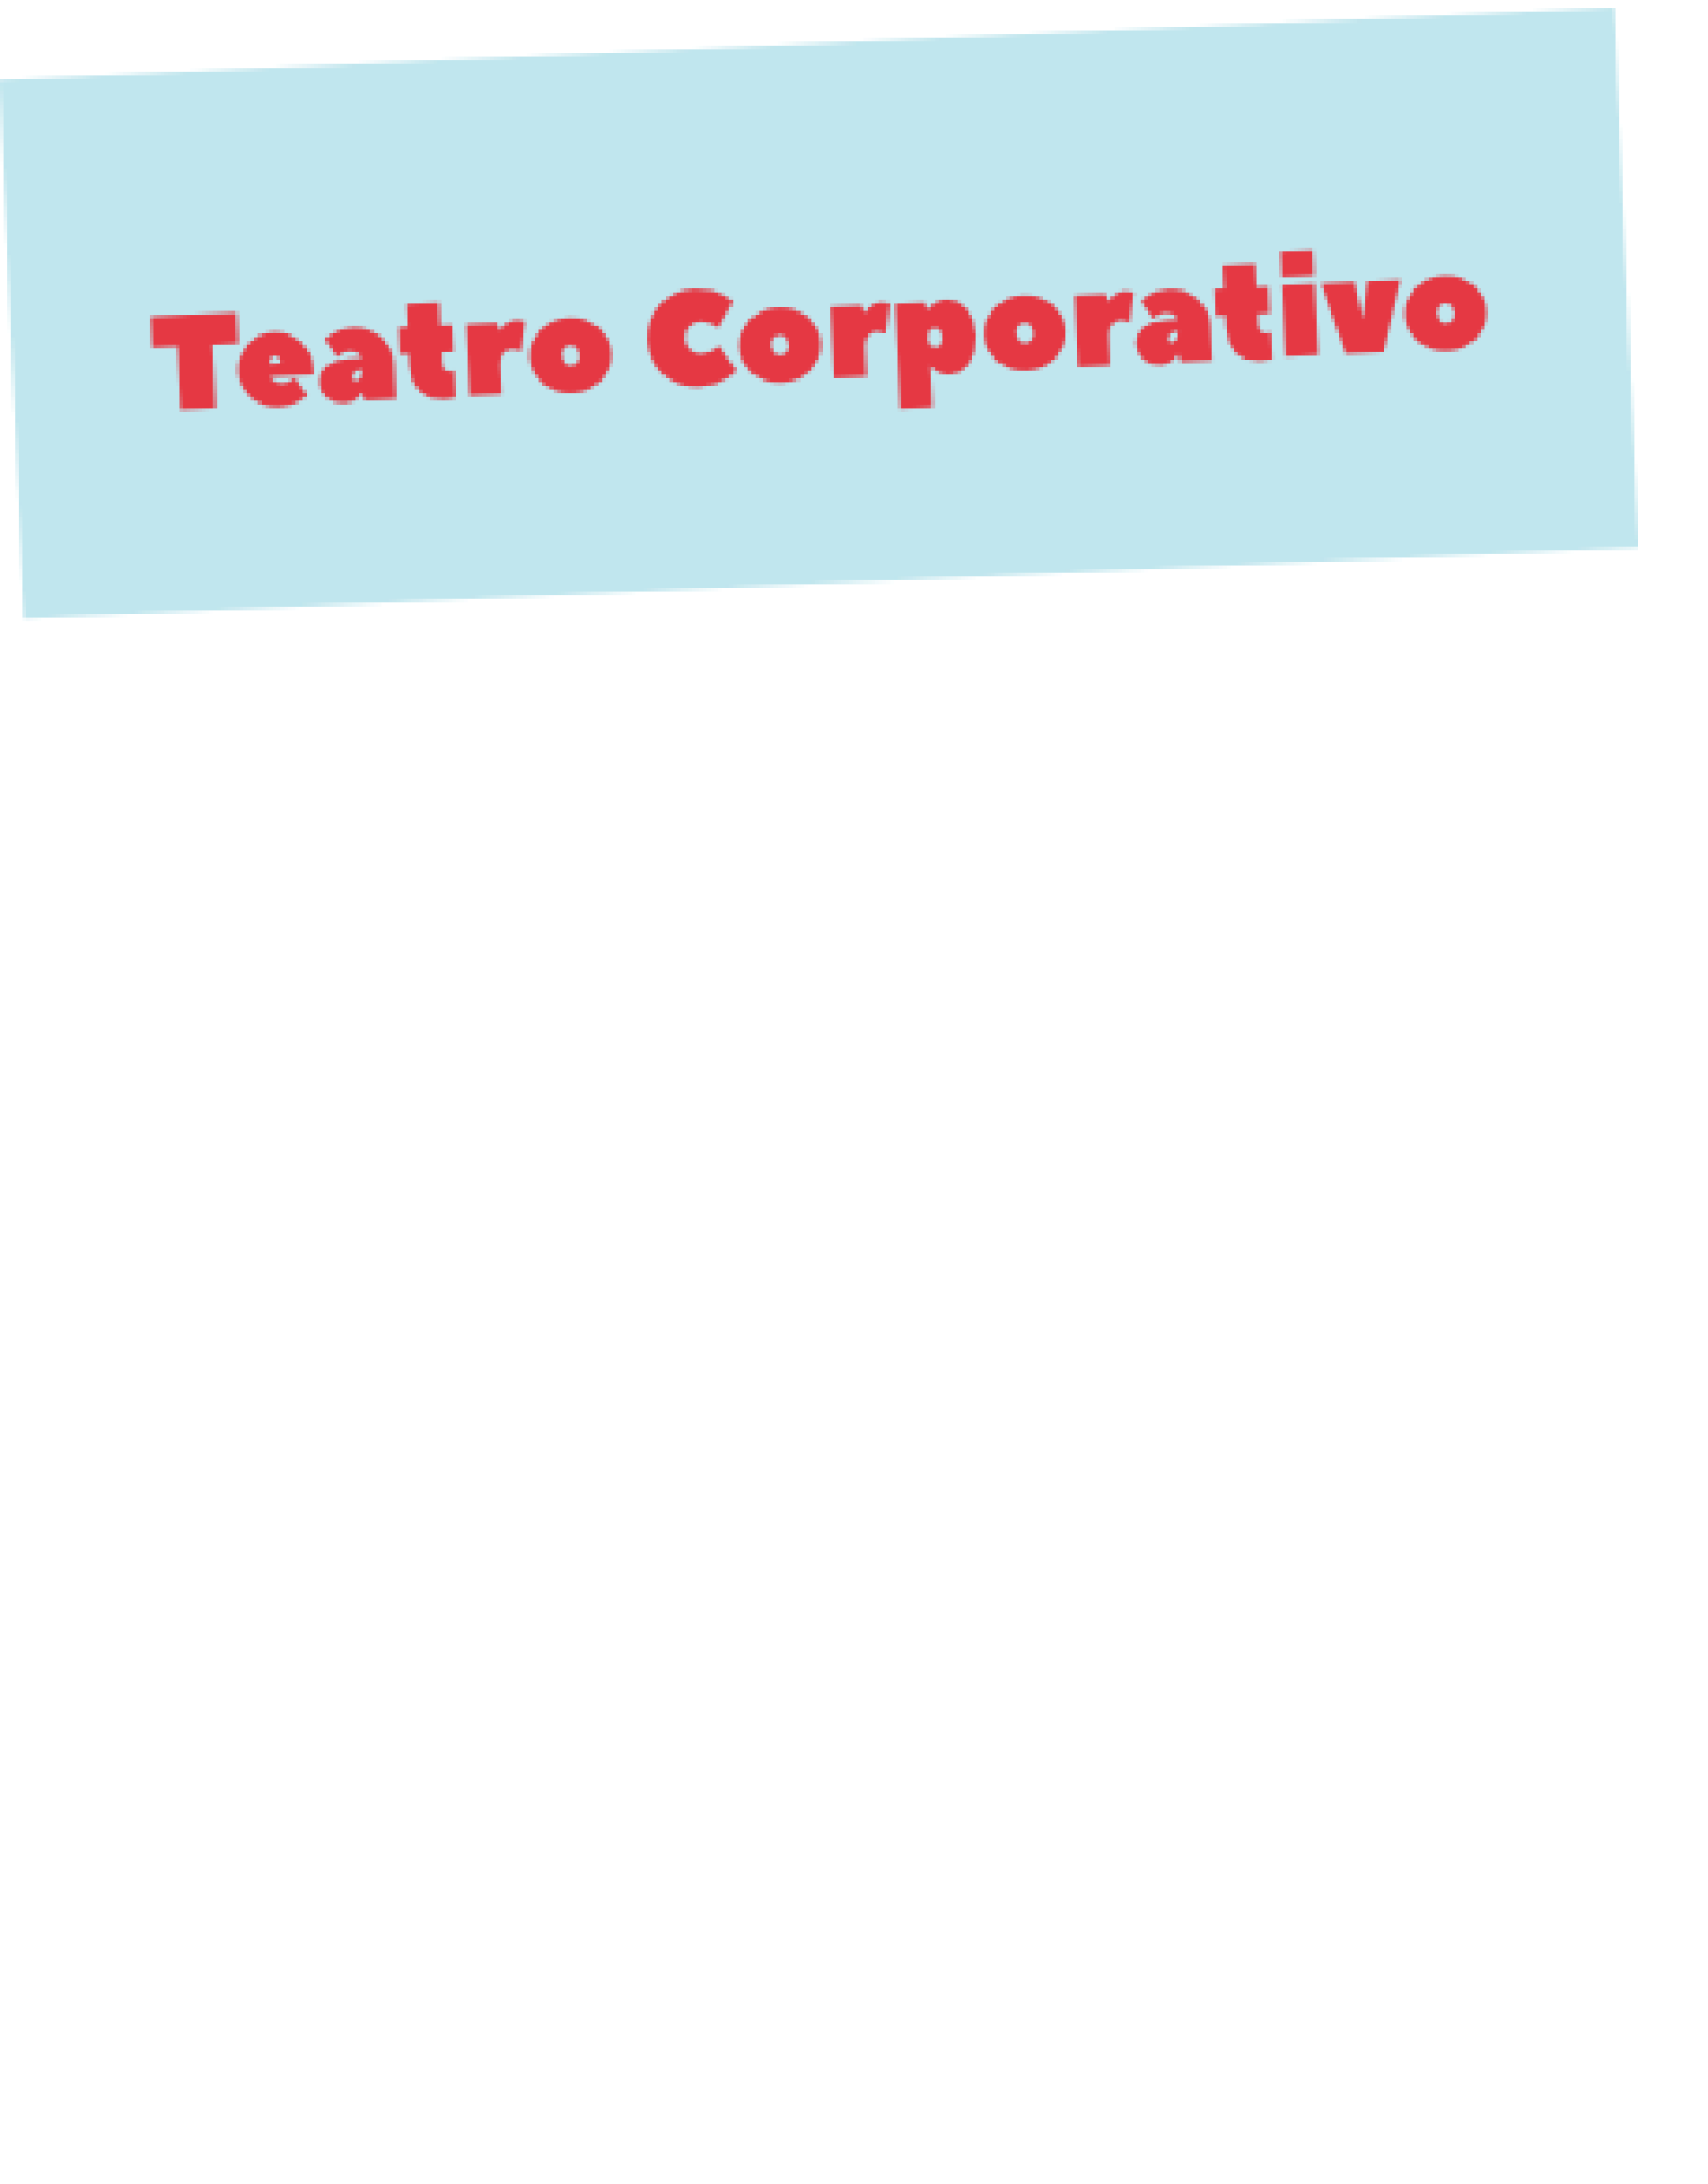 teatrocorporativo2edit-01